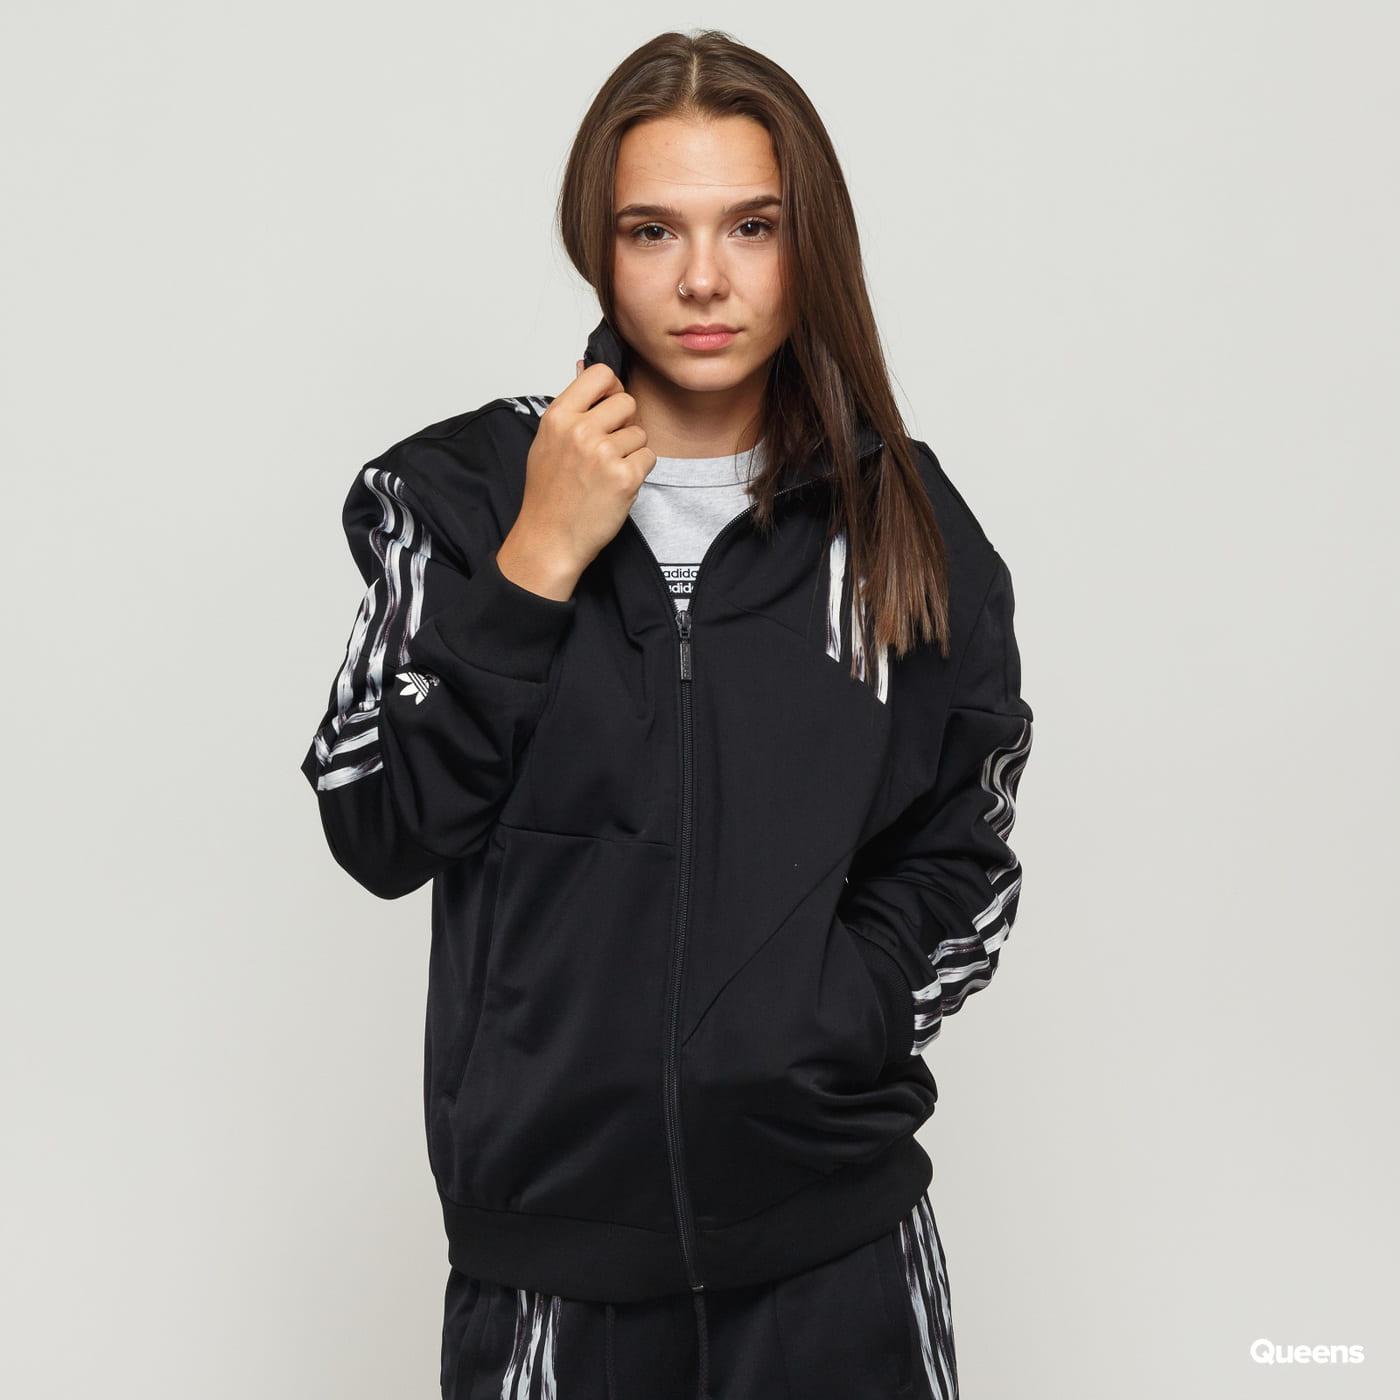 adidas Originals Danielle Cathari Firebird Track Top black